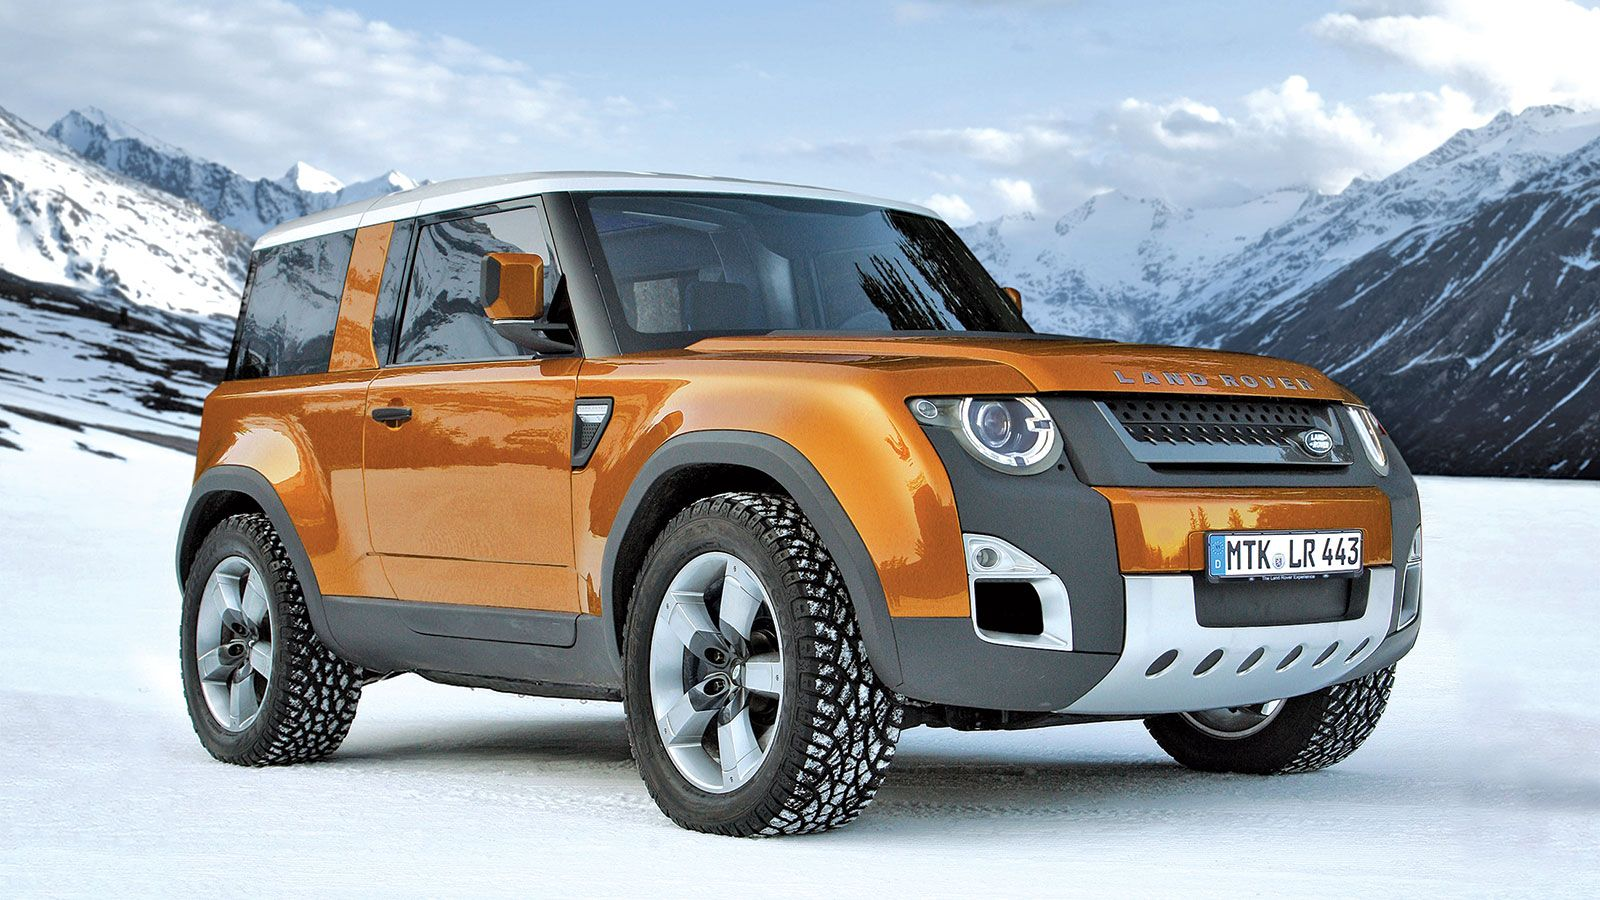 2020 Land Rover Defender >> ΑΠΟΚΛΕΙΣΤΙΚΟ: Όλα τα SUV Supercars που έρχονται Audi BMW Dacia Land